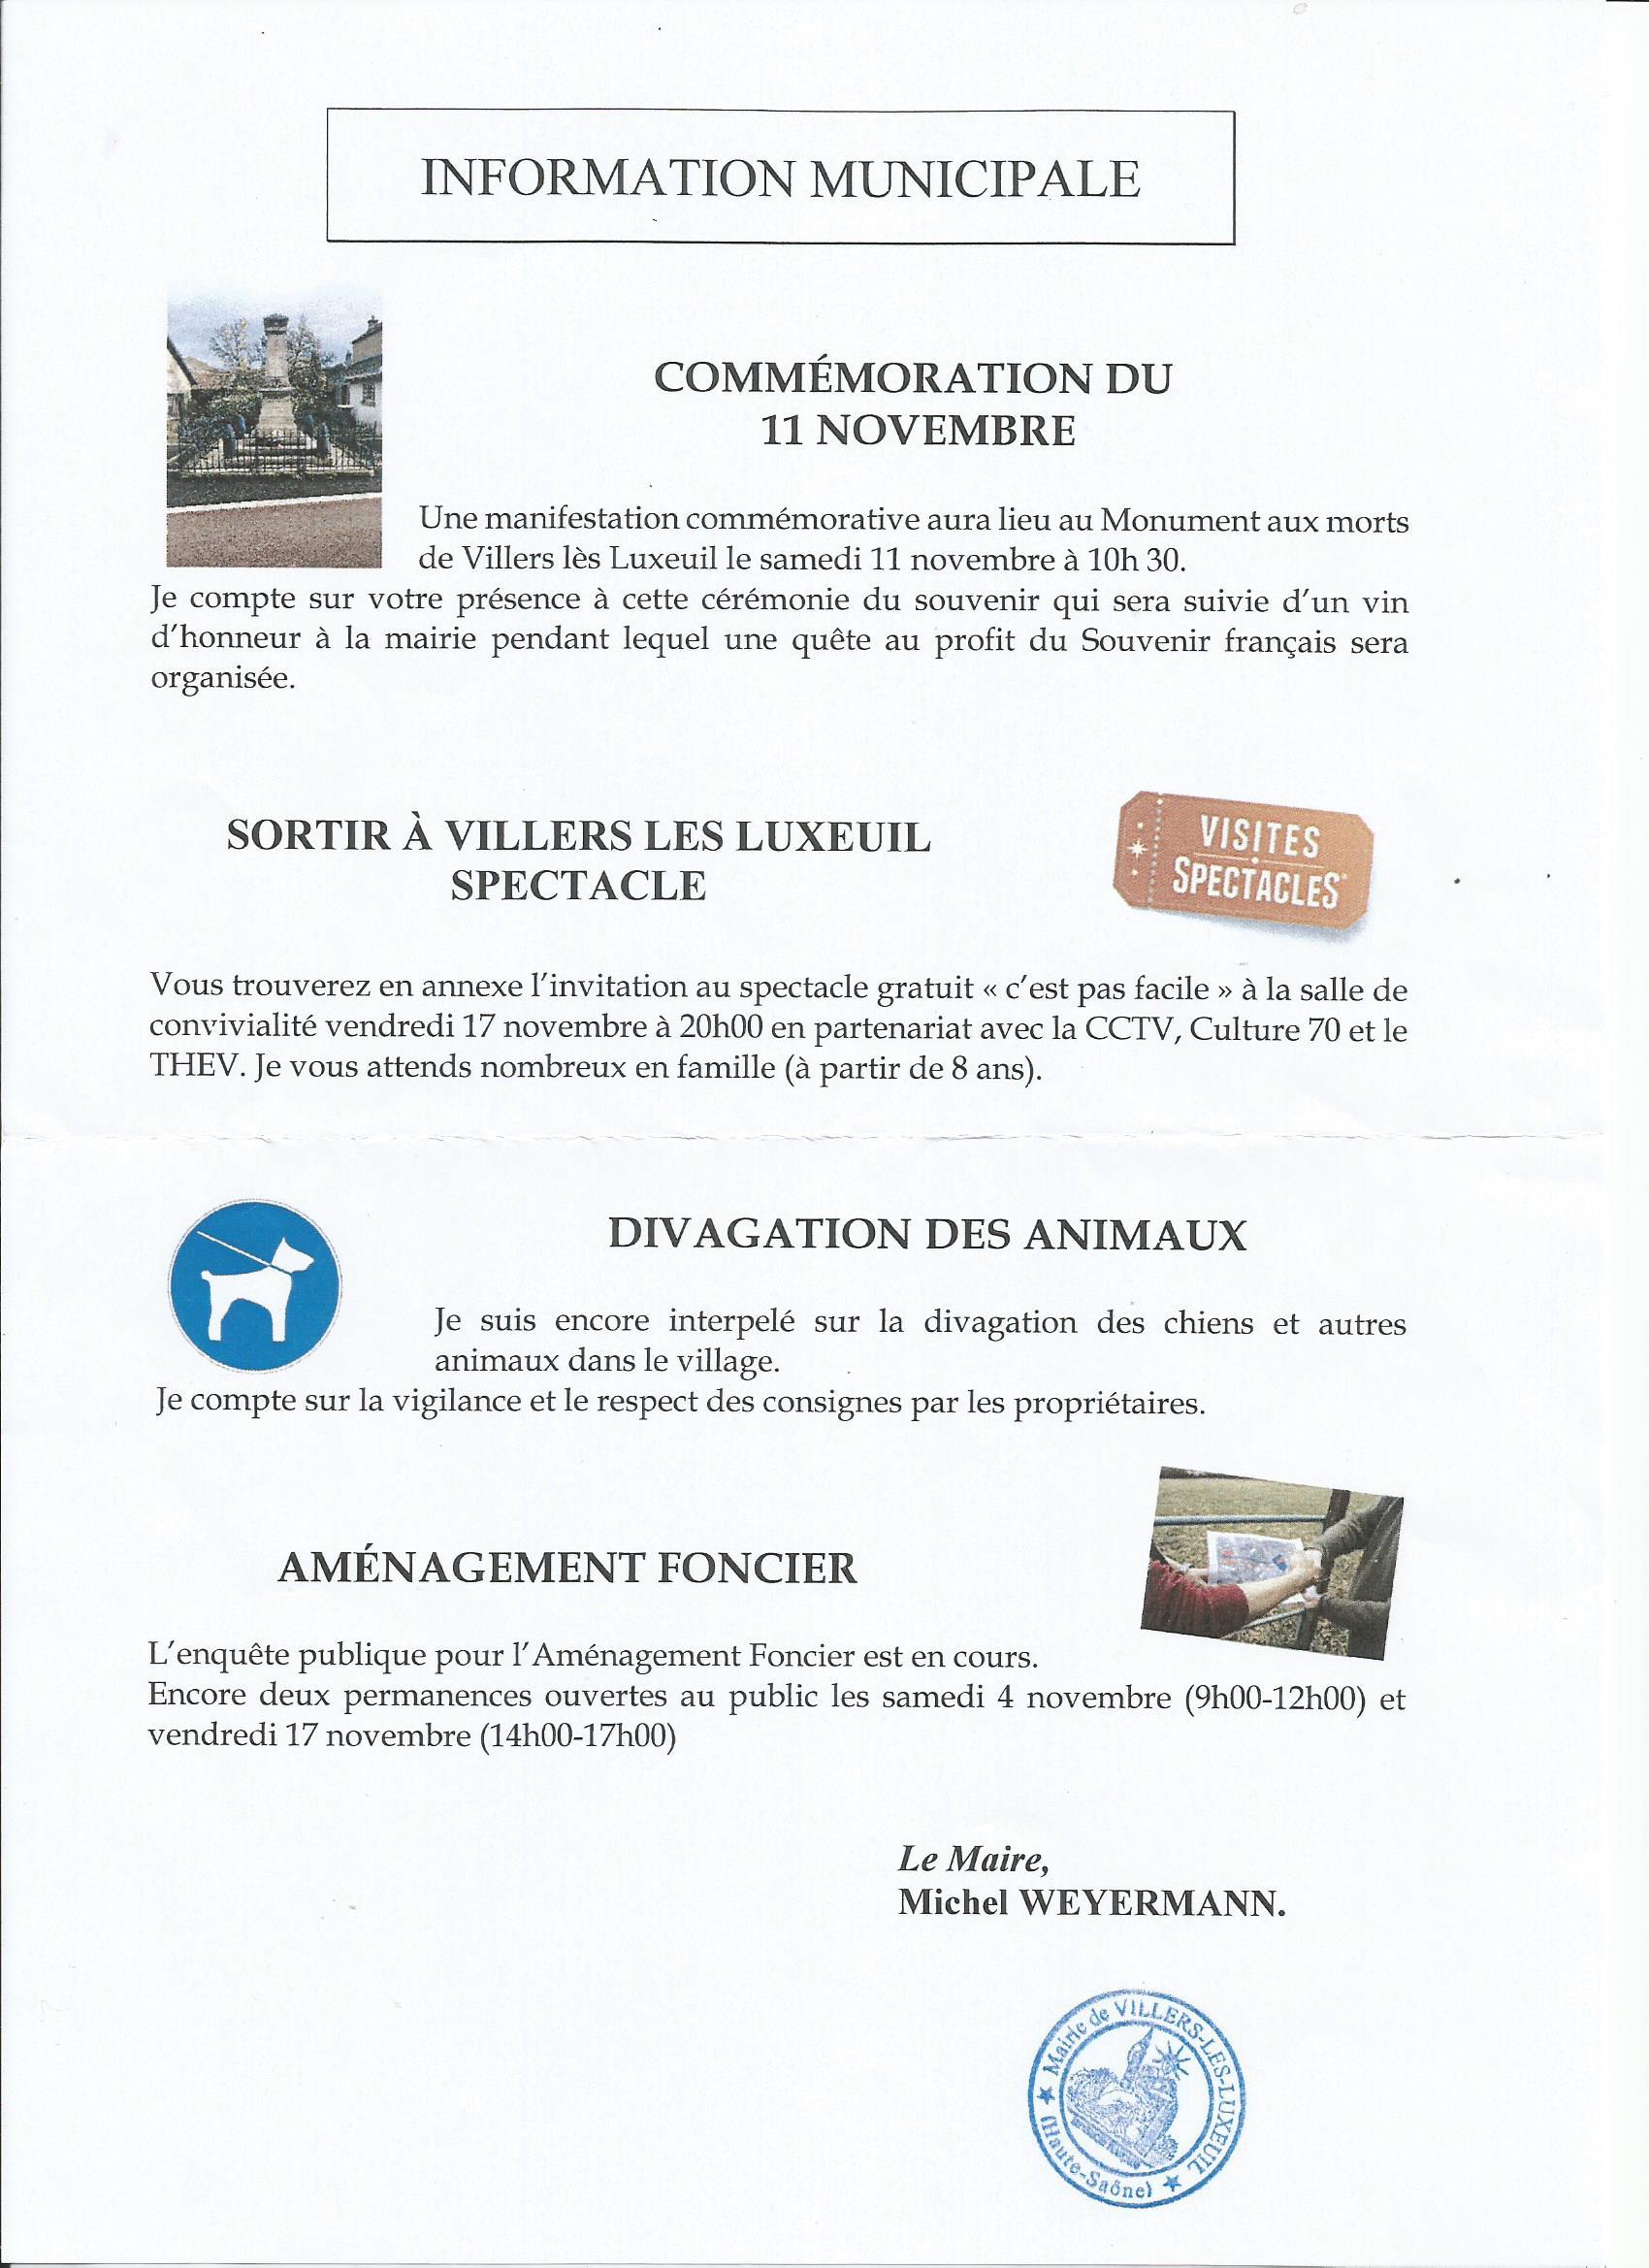 https://www.villers-les-luxeuil.com/projets/villers/files/images/2017_Mairie/Divers_pour_site/InfoMuncipaleNov2017.jpg